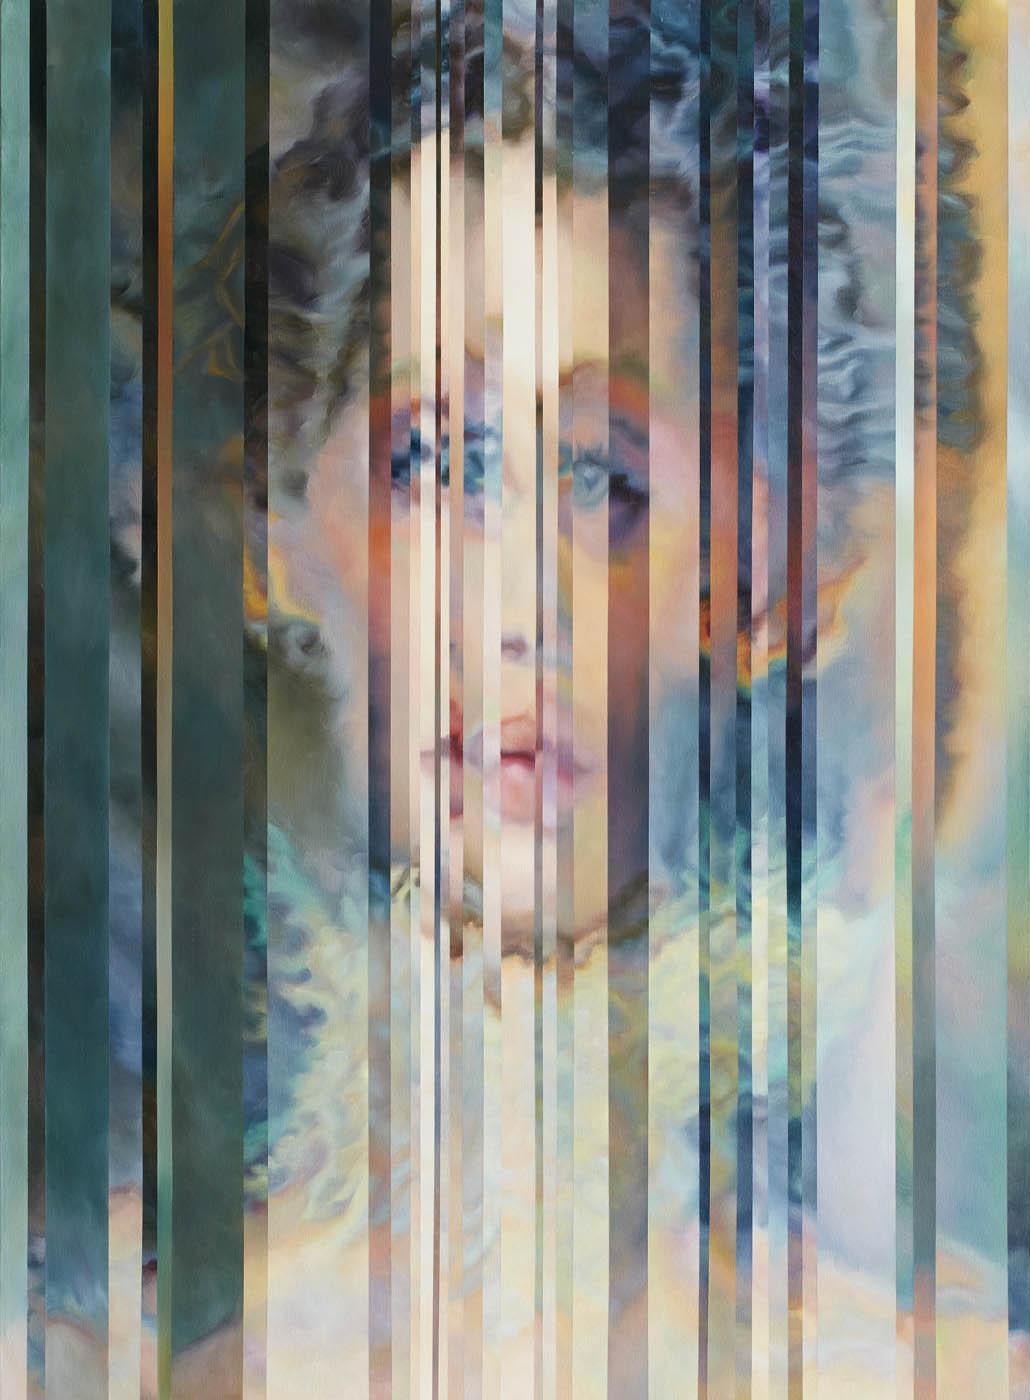 Amanda Clyne - With Restraint